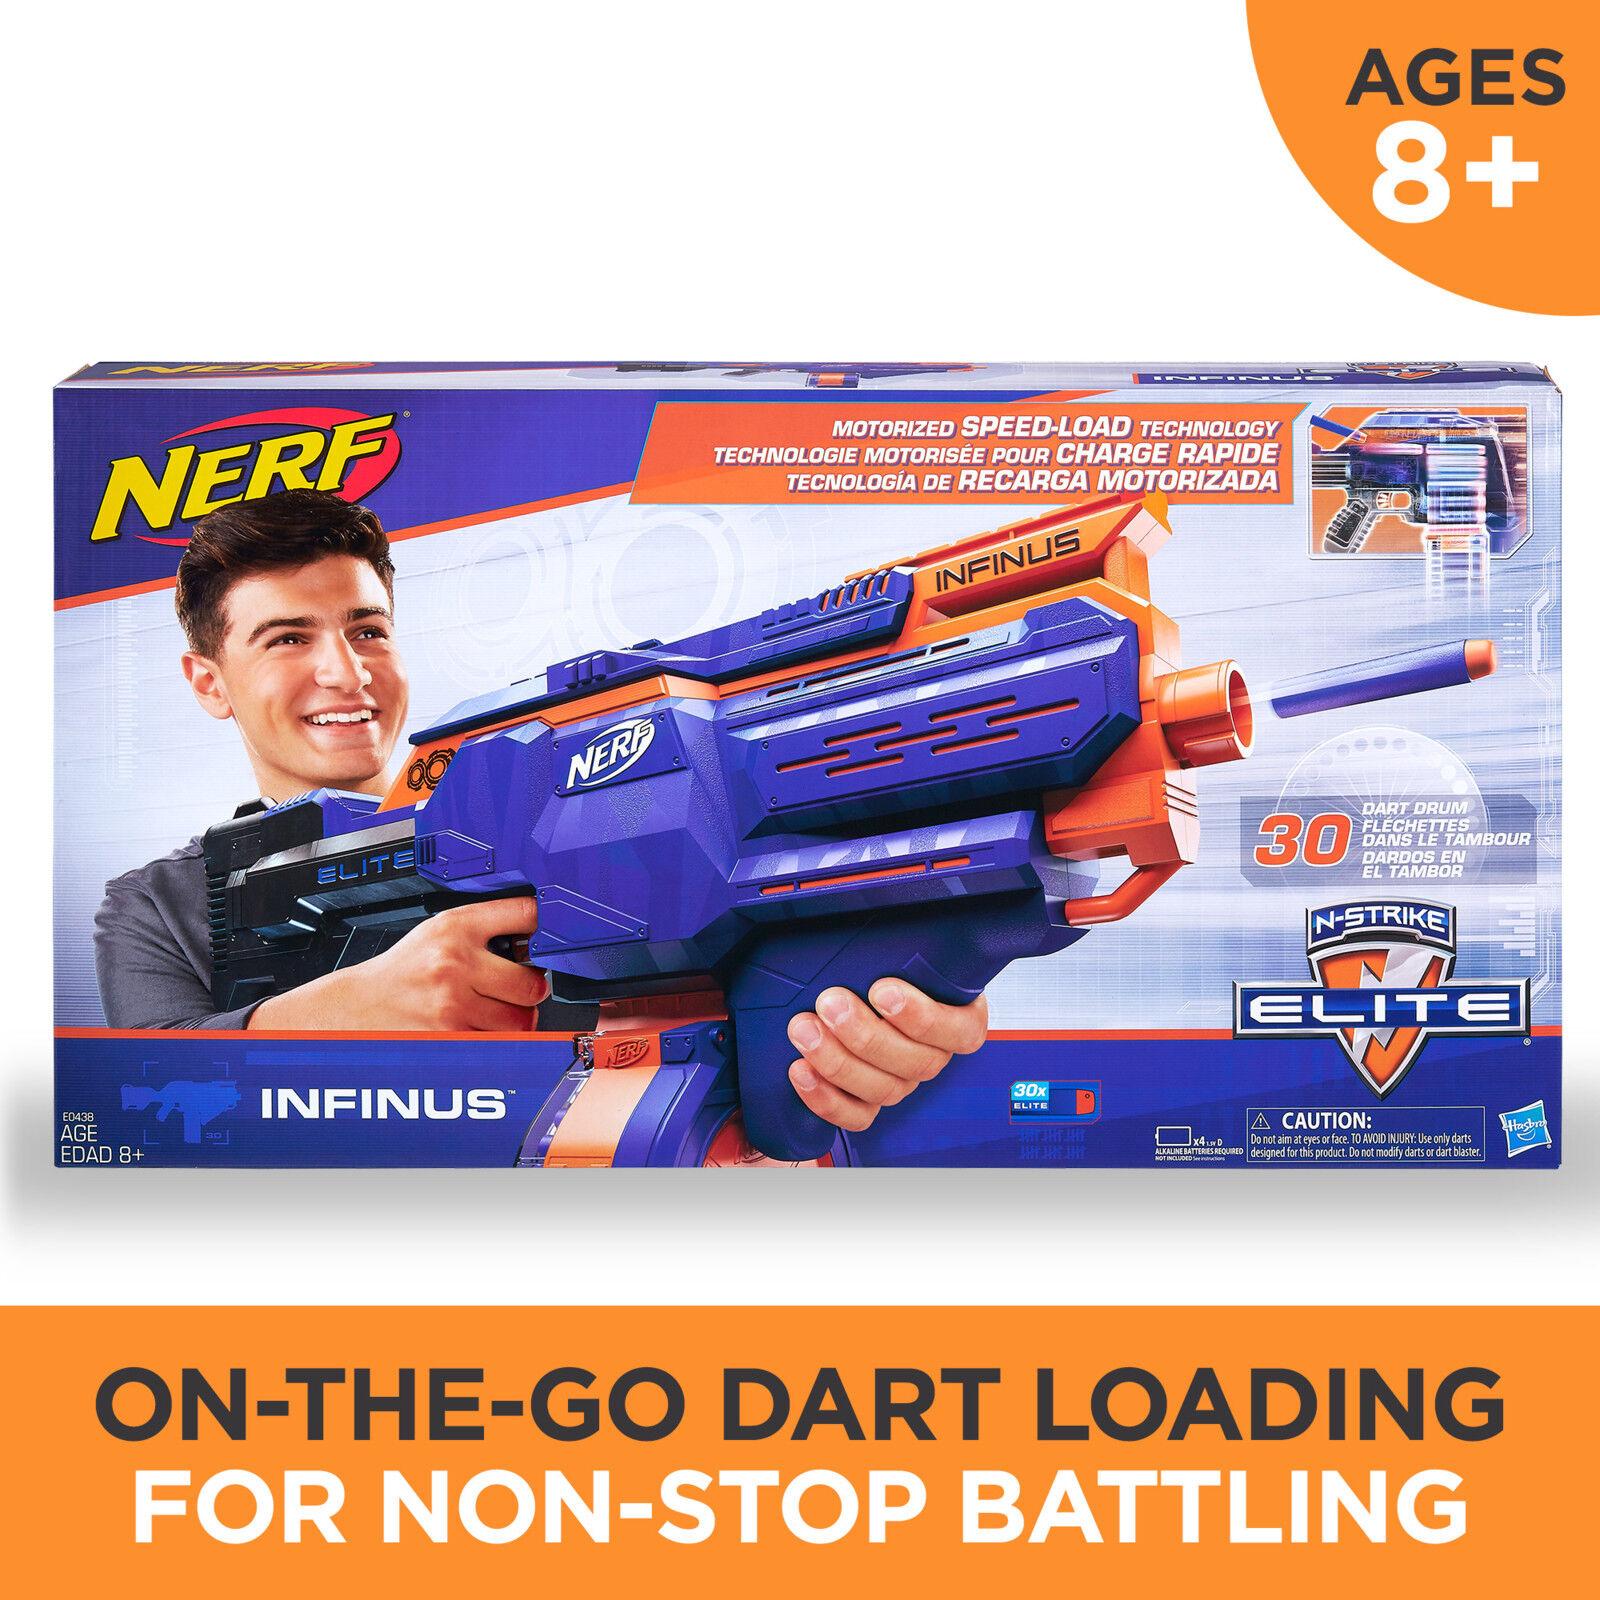 Nerf-N strike Elite Infinus Boys Girls Kids Toy Gun 30 Rapid